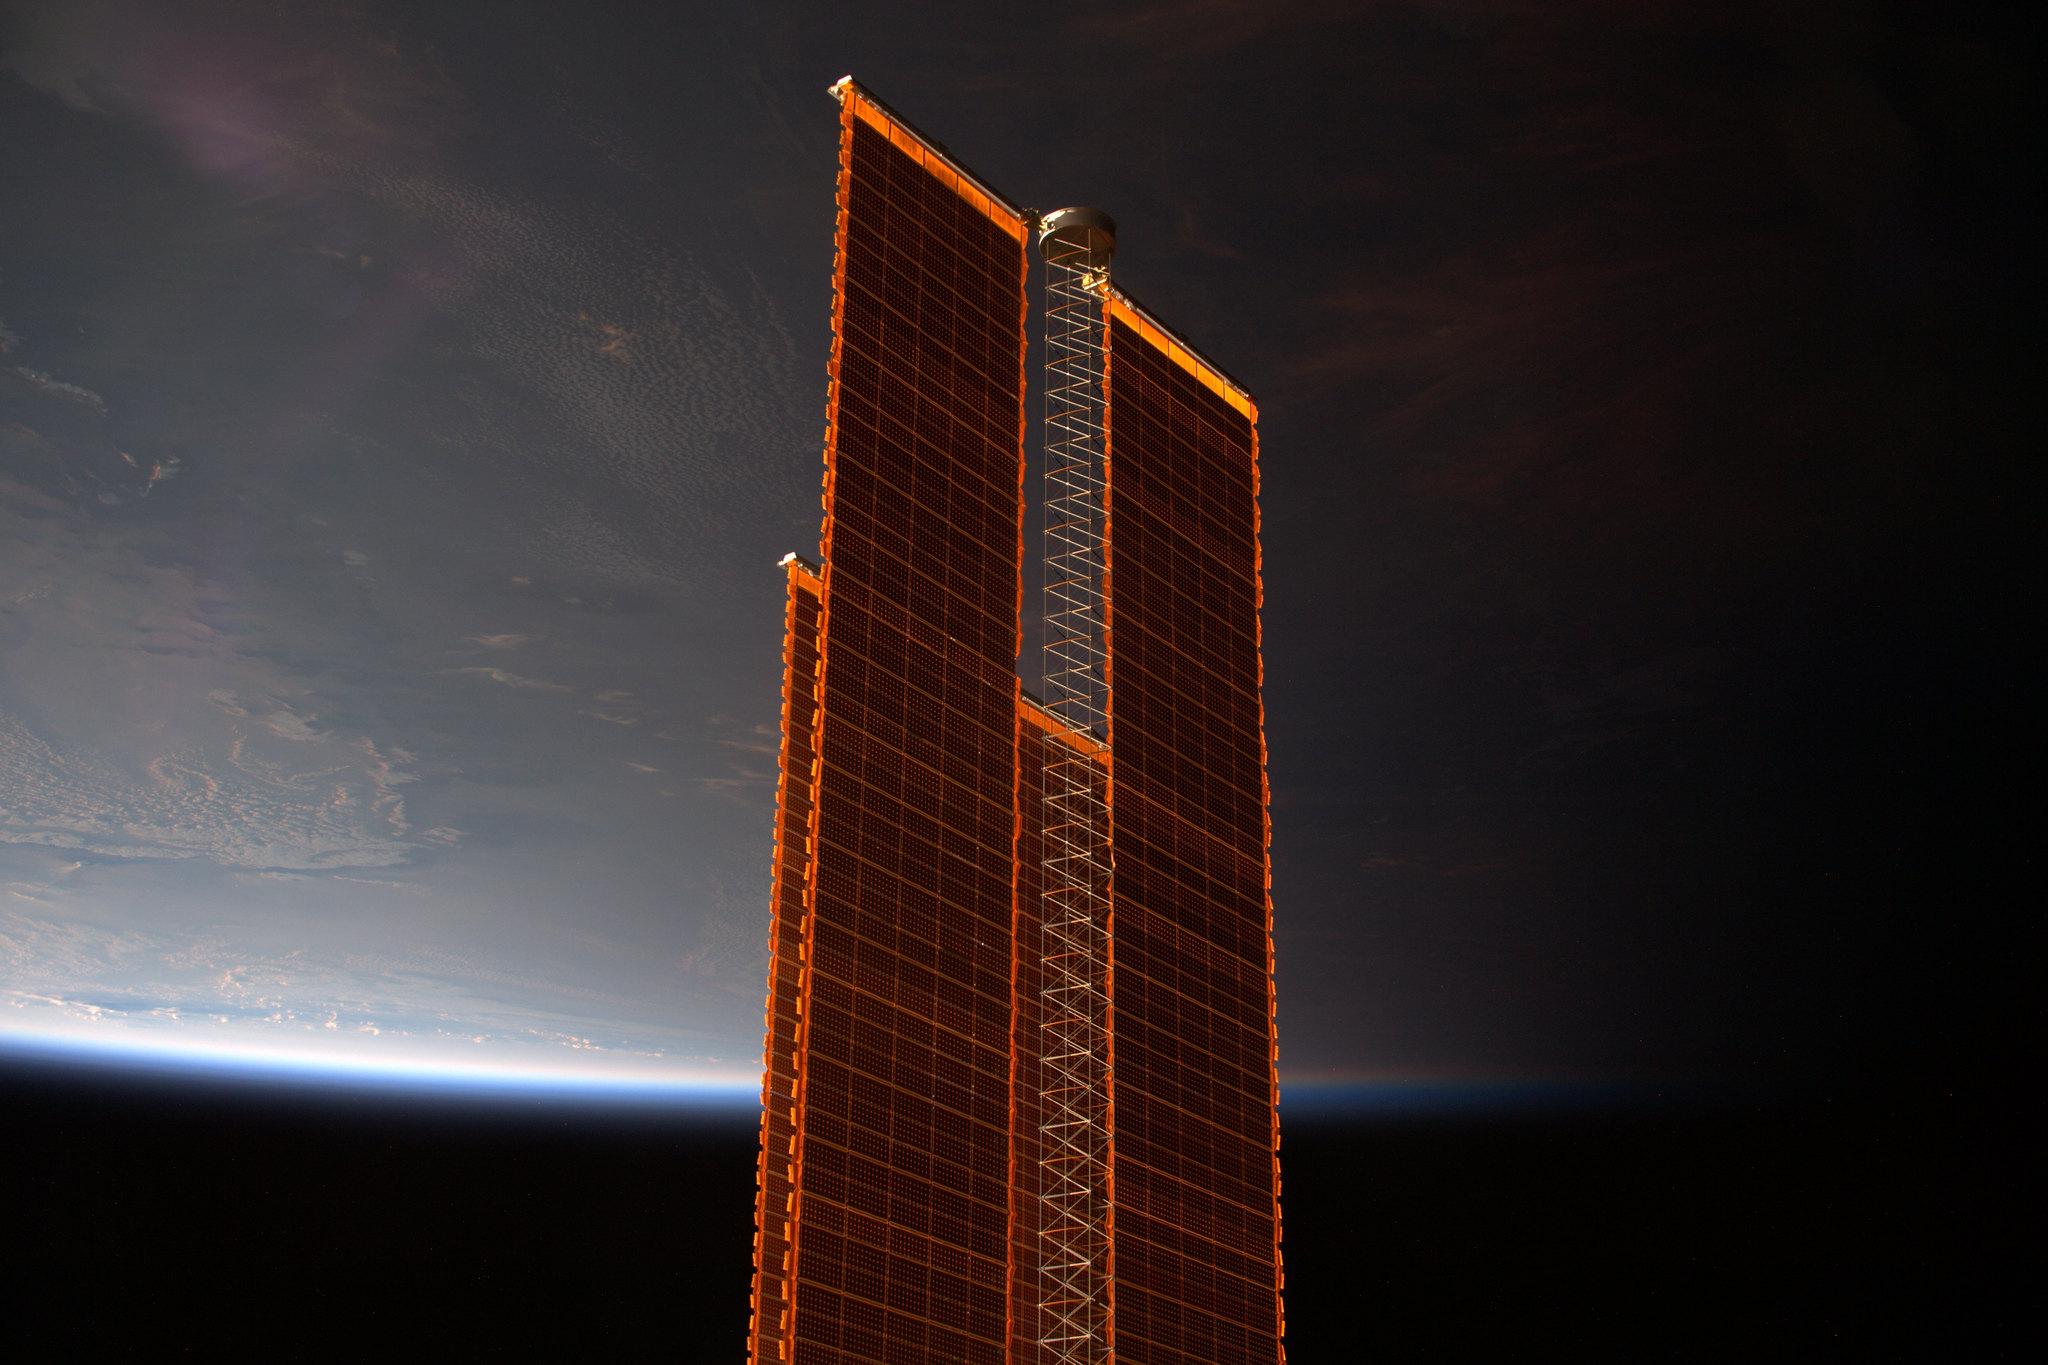 French Astronaut Thomas Pesquet - Night & Day